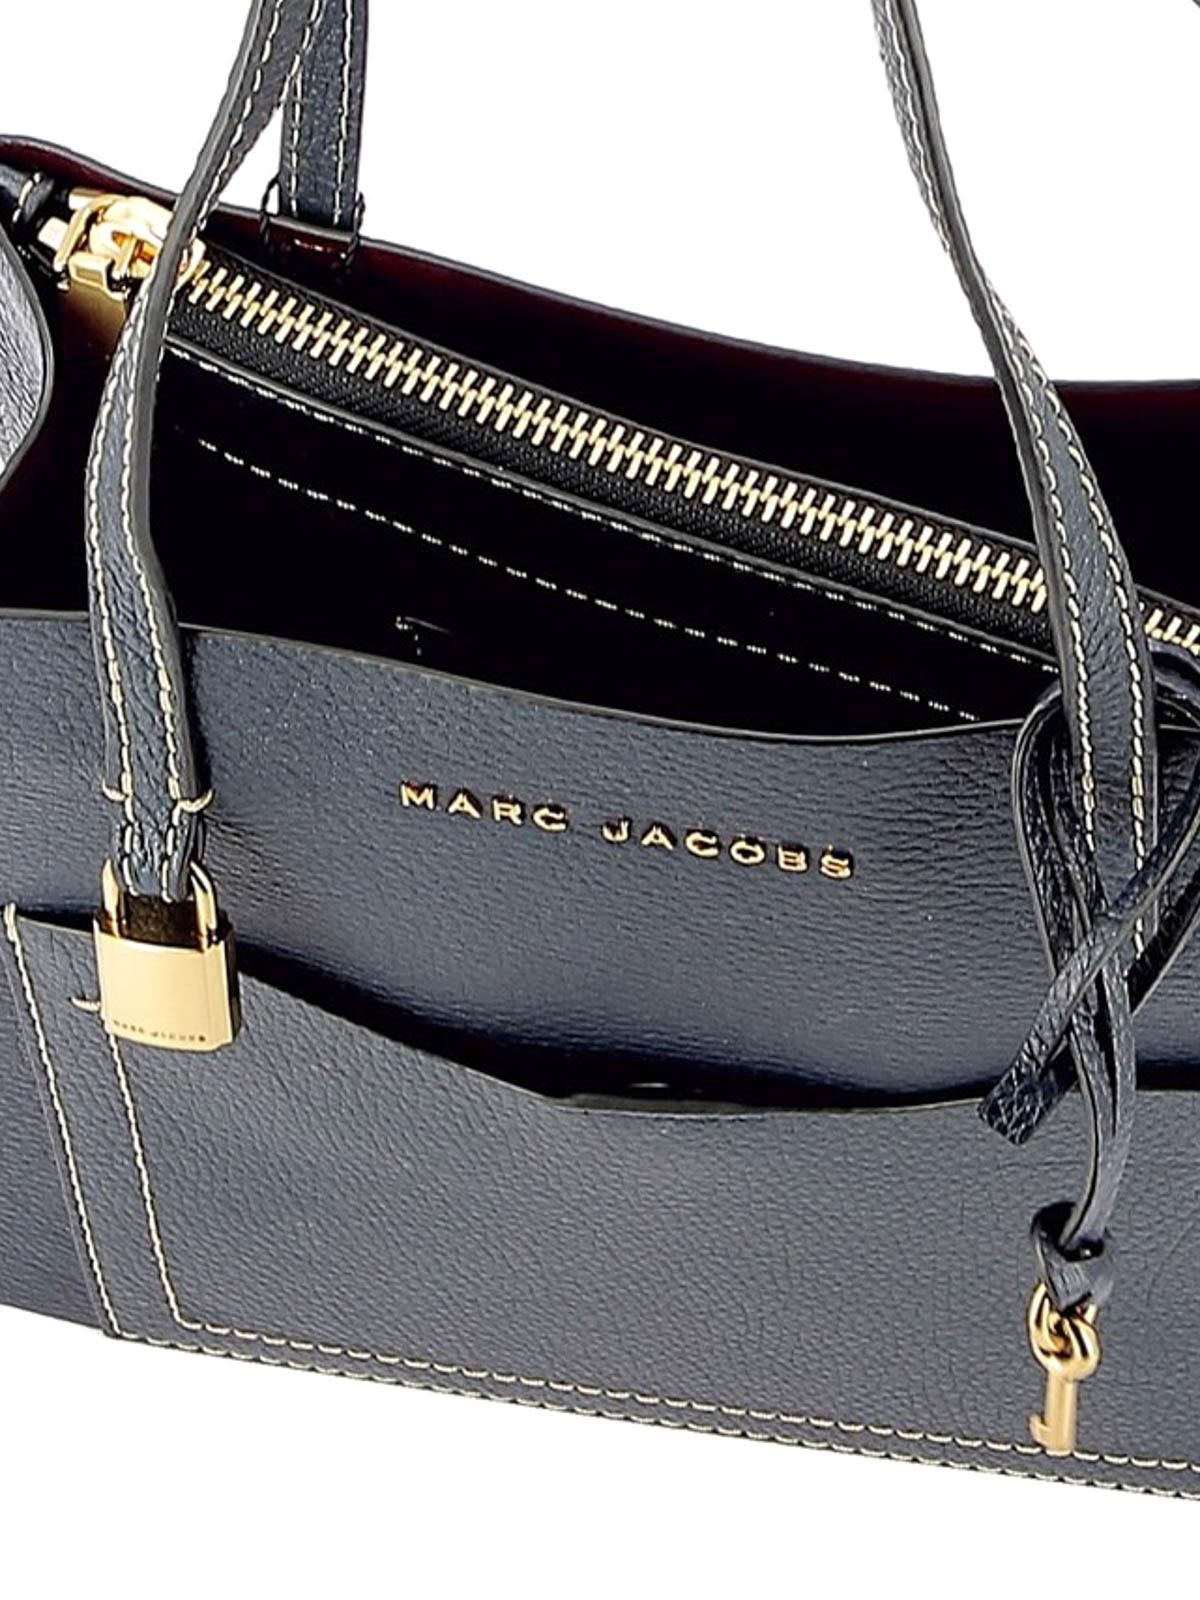 23ca0875ffbd Grind medium tote shop online  MARC JACOBS · MARC JACOBS  totes bags ...